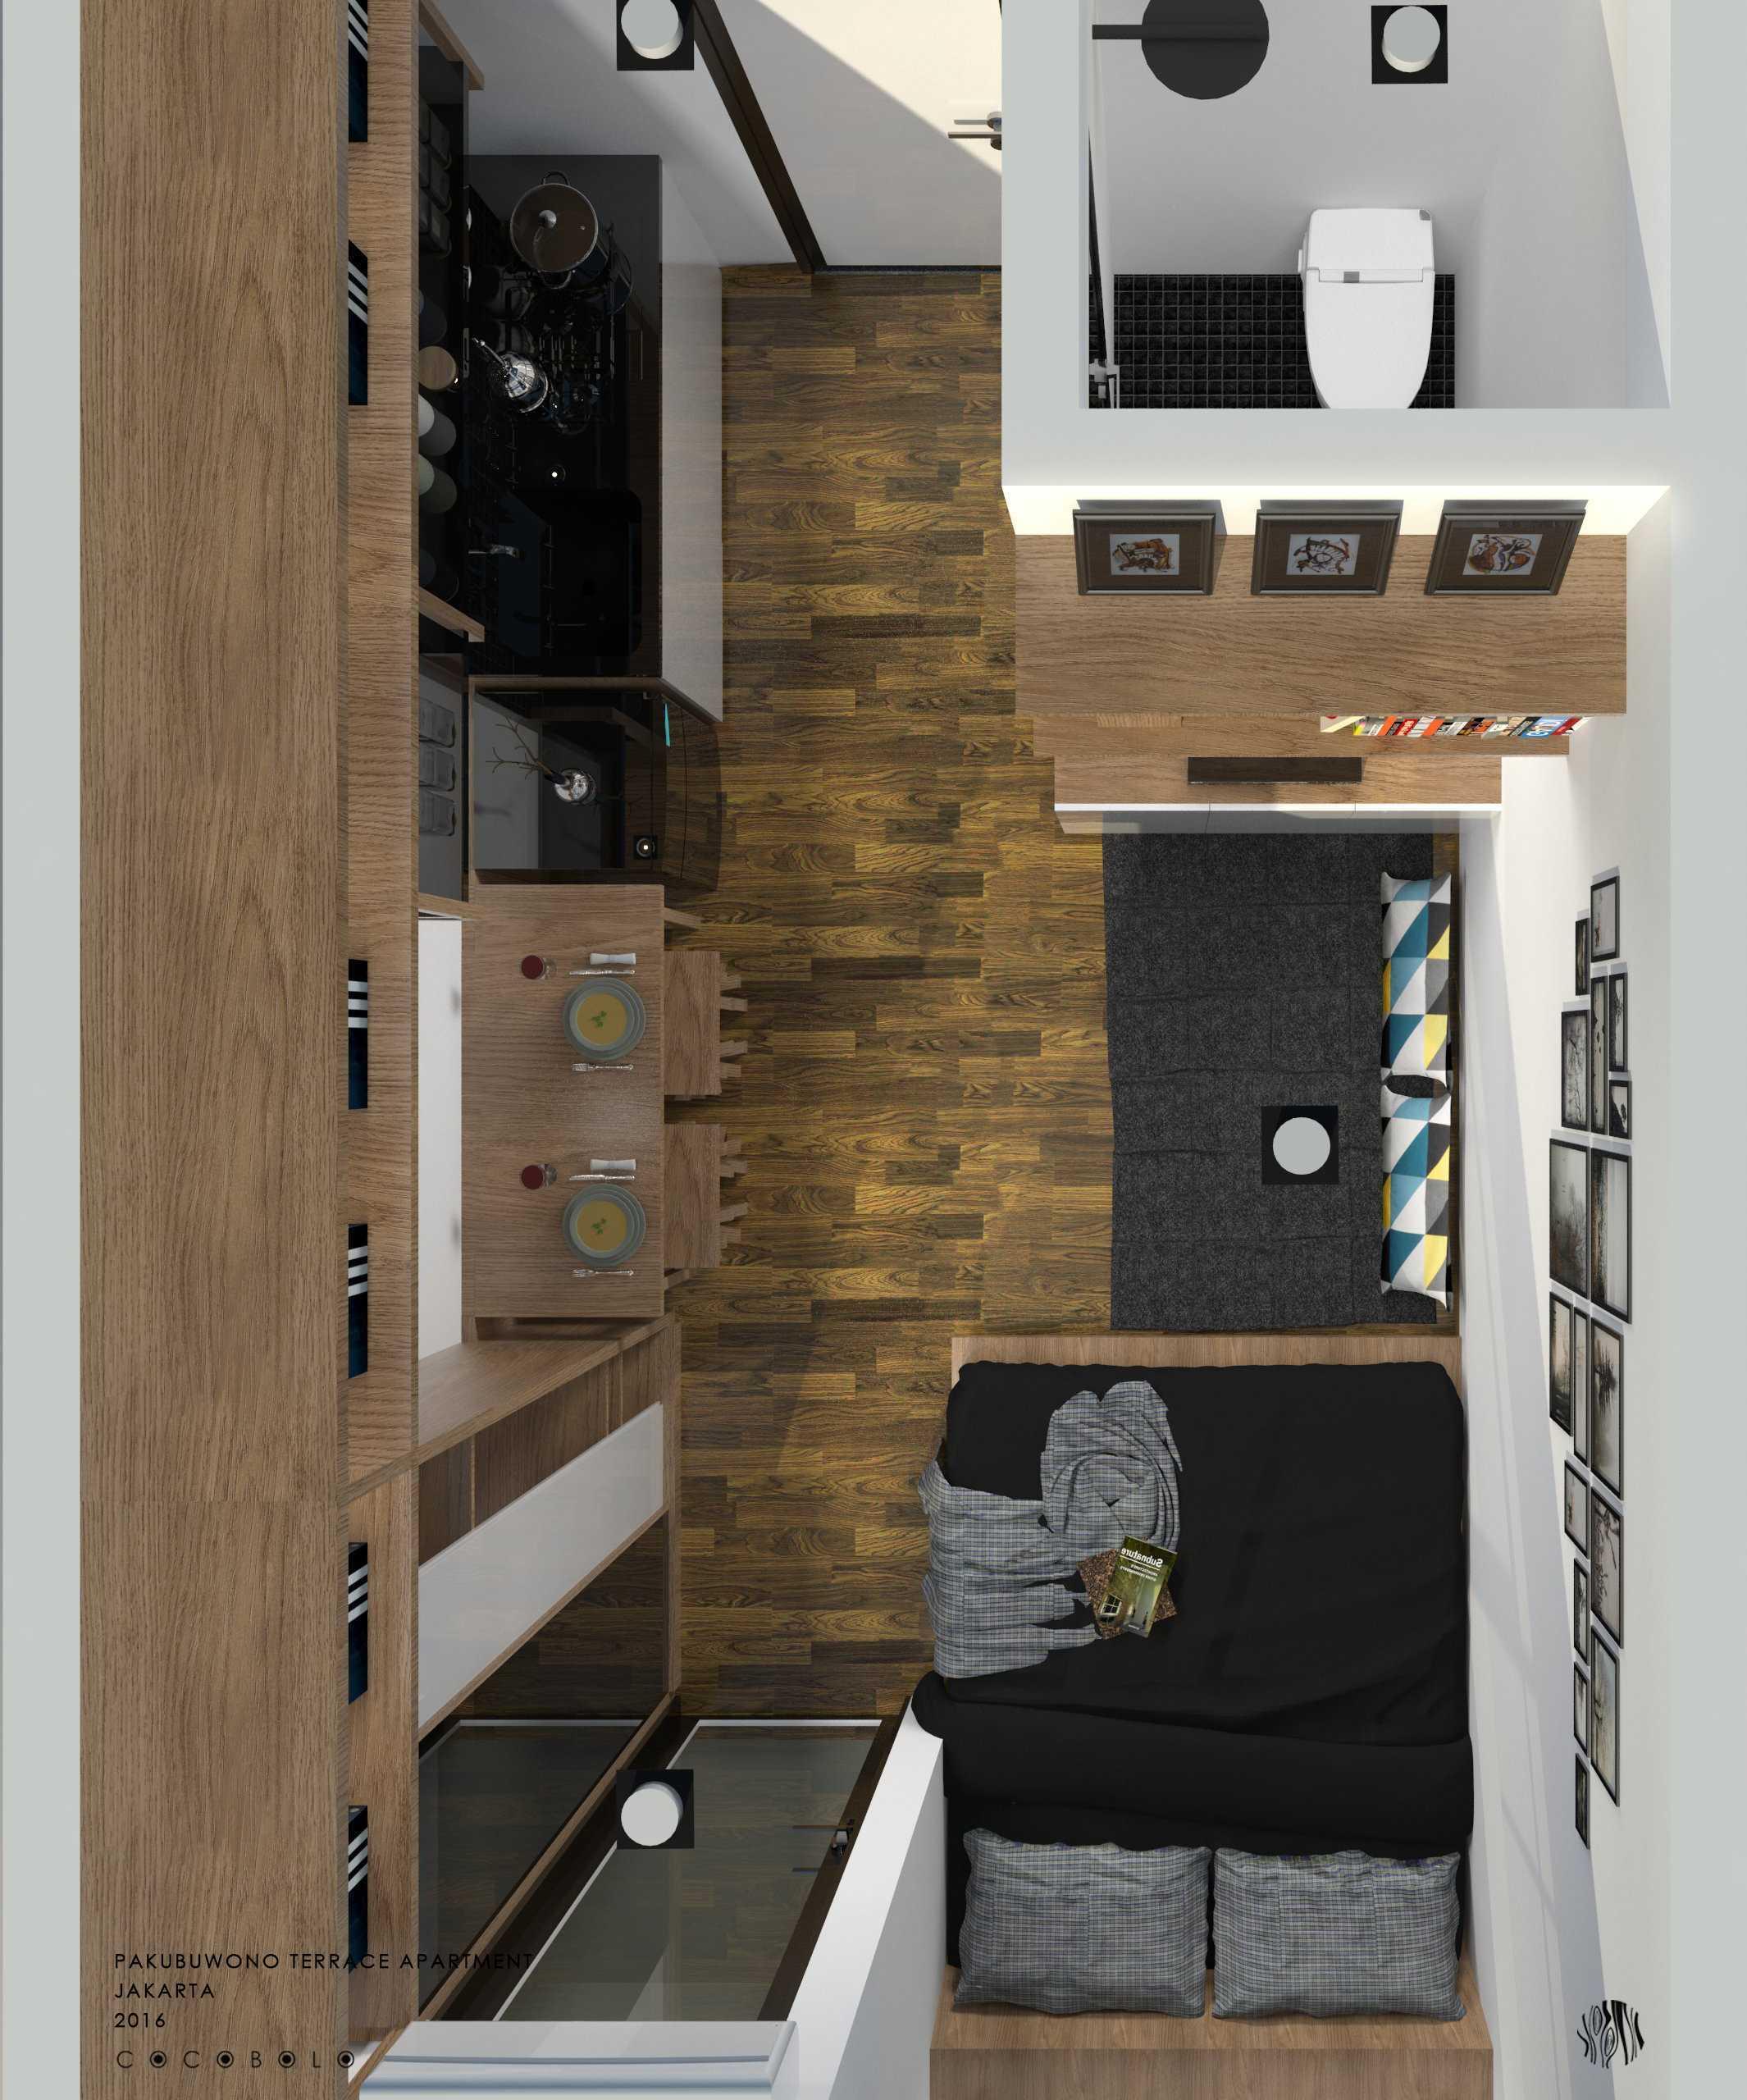 Cocobolo Studio Mj's Apartment Pakubuwono Apartment, Jakarta Pakubuwono Apartment, Jakarta Mj's 3 Minimalis  12271